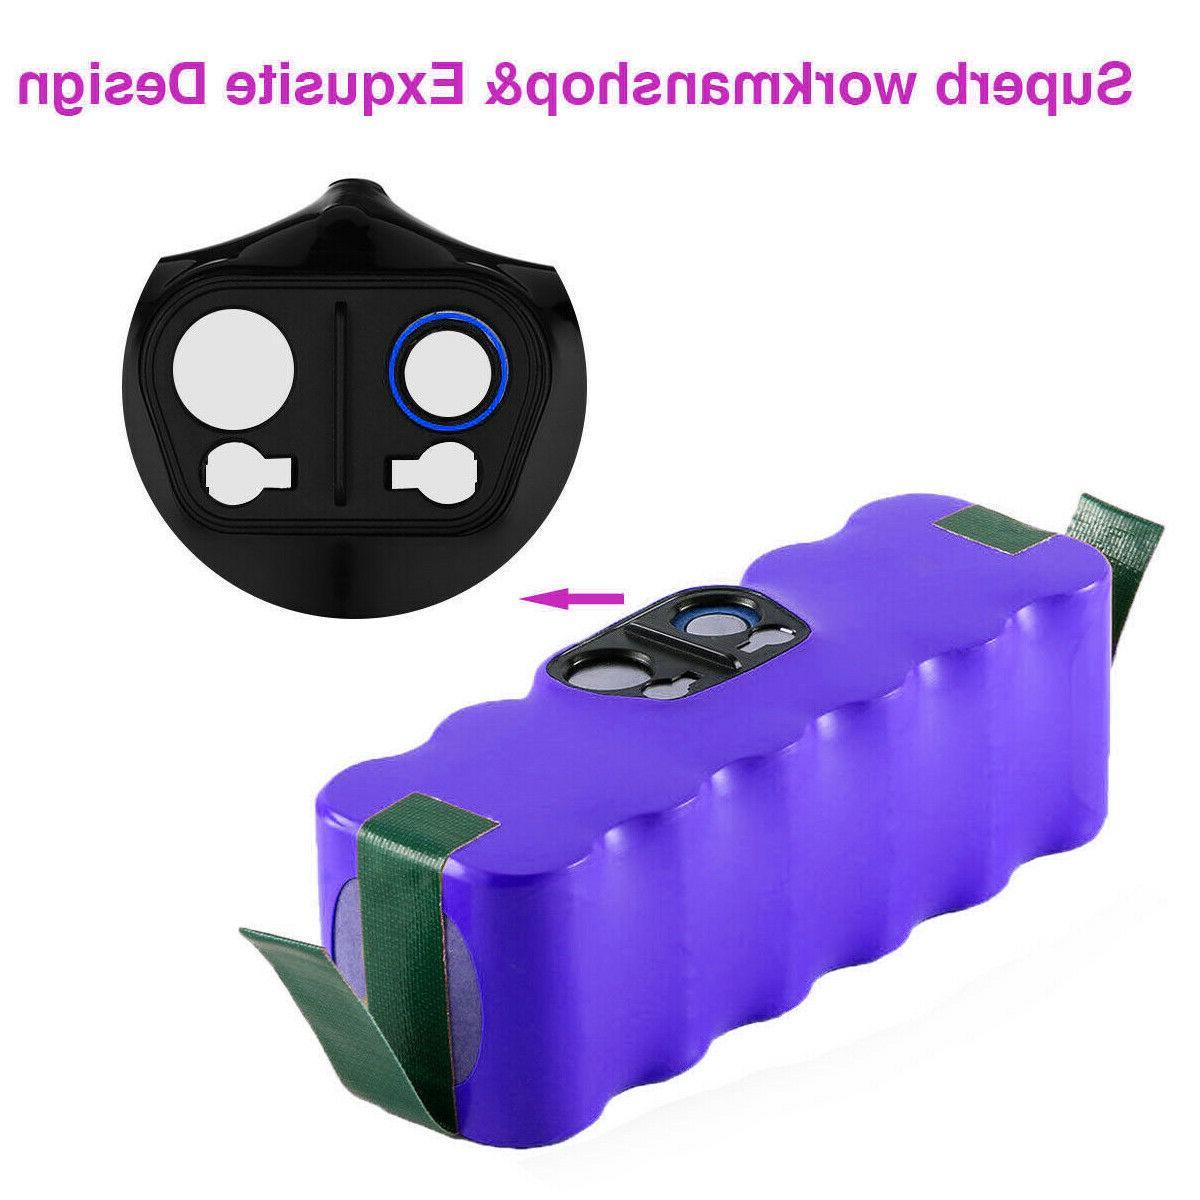 4500mAh 14.4V Roomba 890 600 Robot Vacuum Cleaner